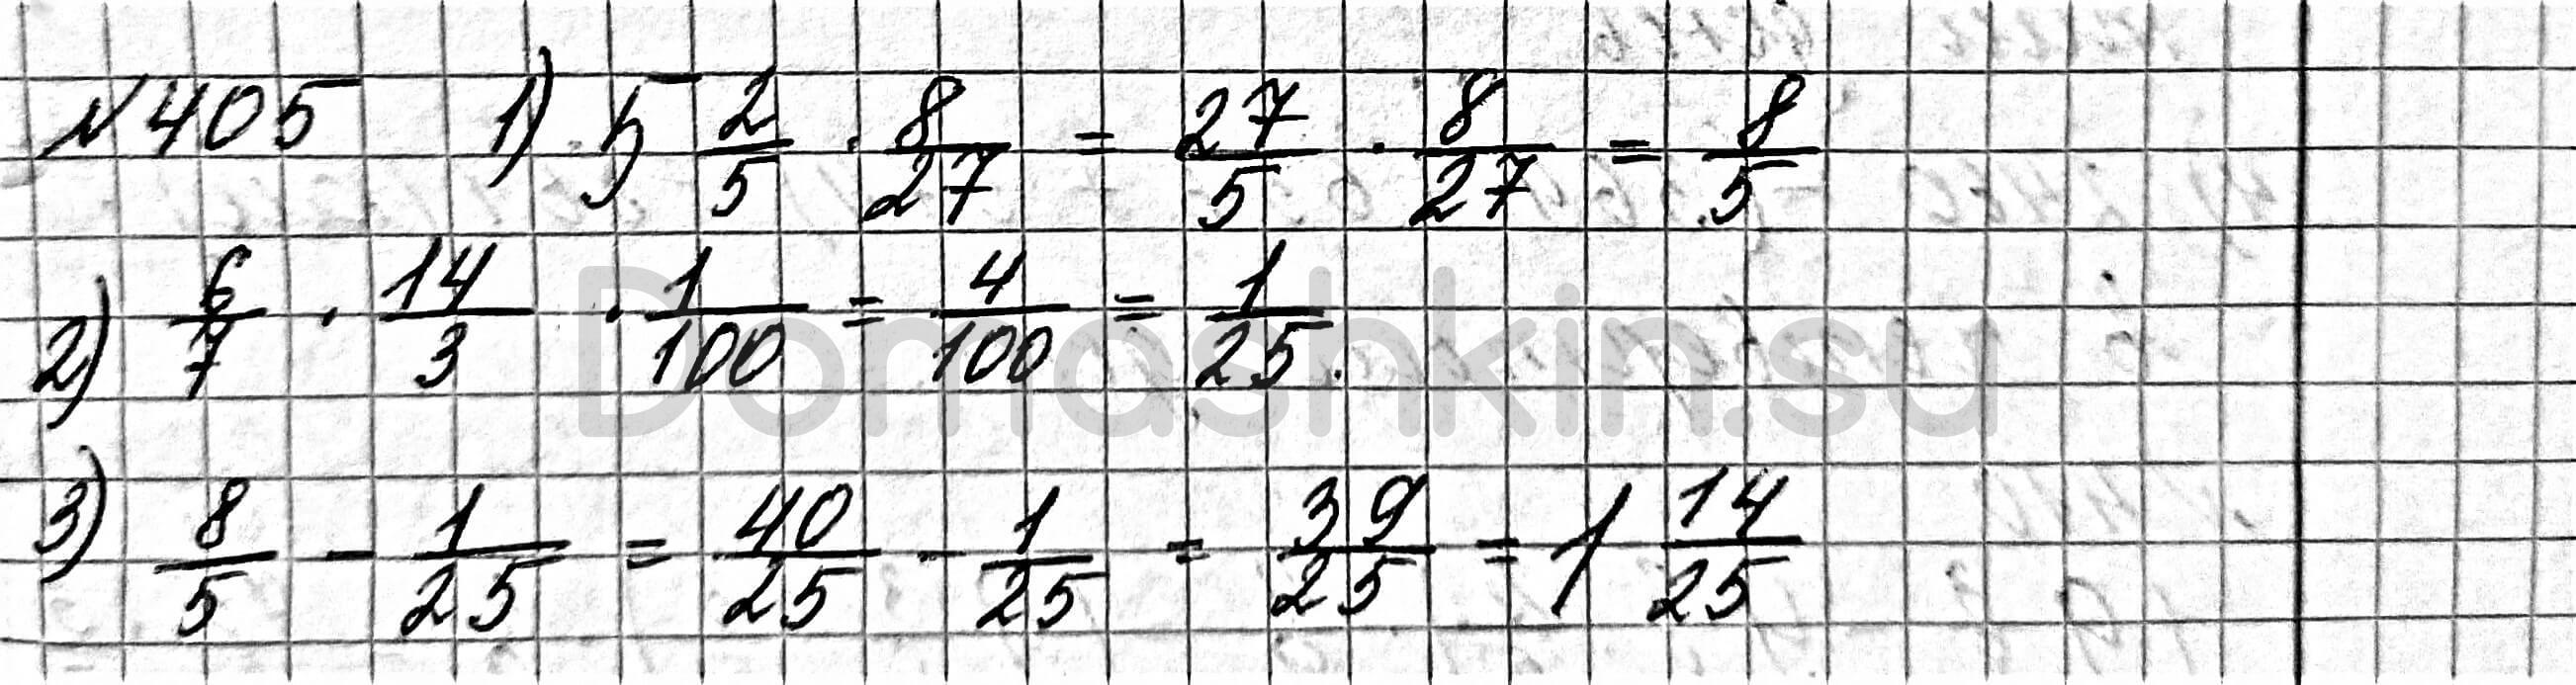 Математика 6 класс учебник Мерзляк номер 405 решение